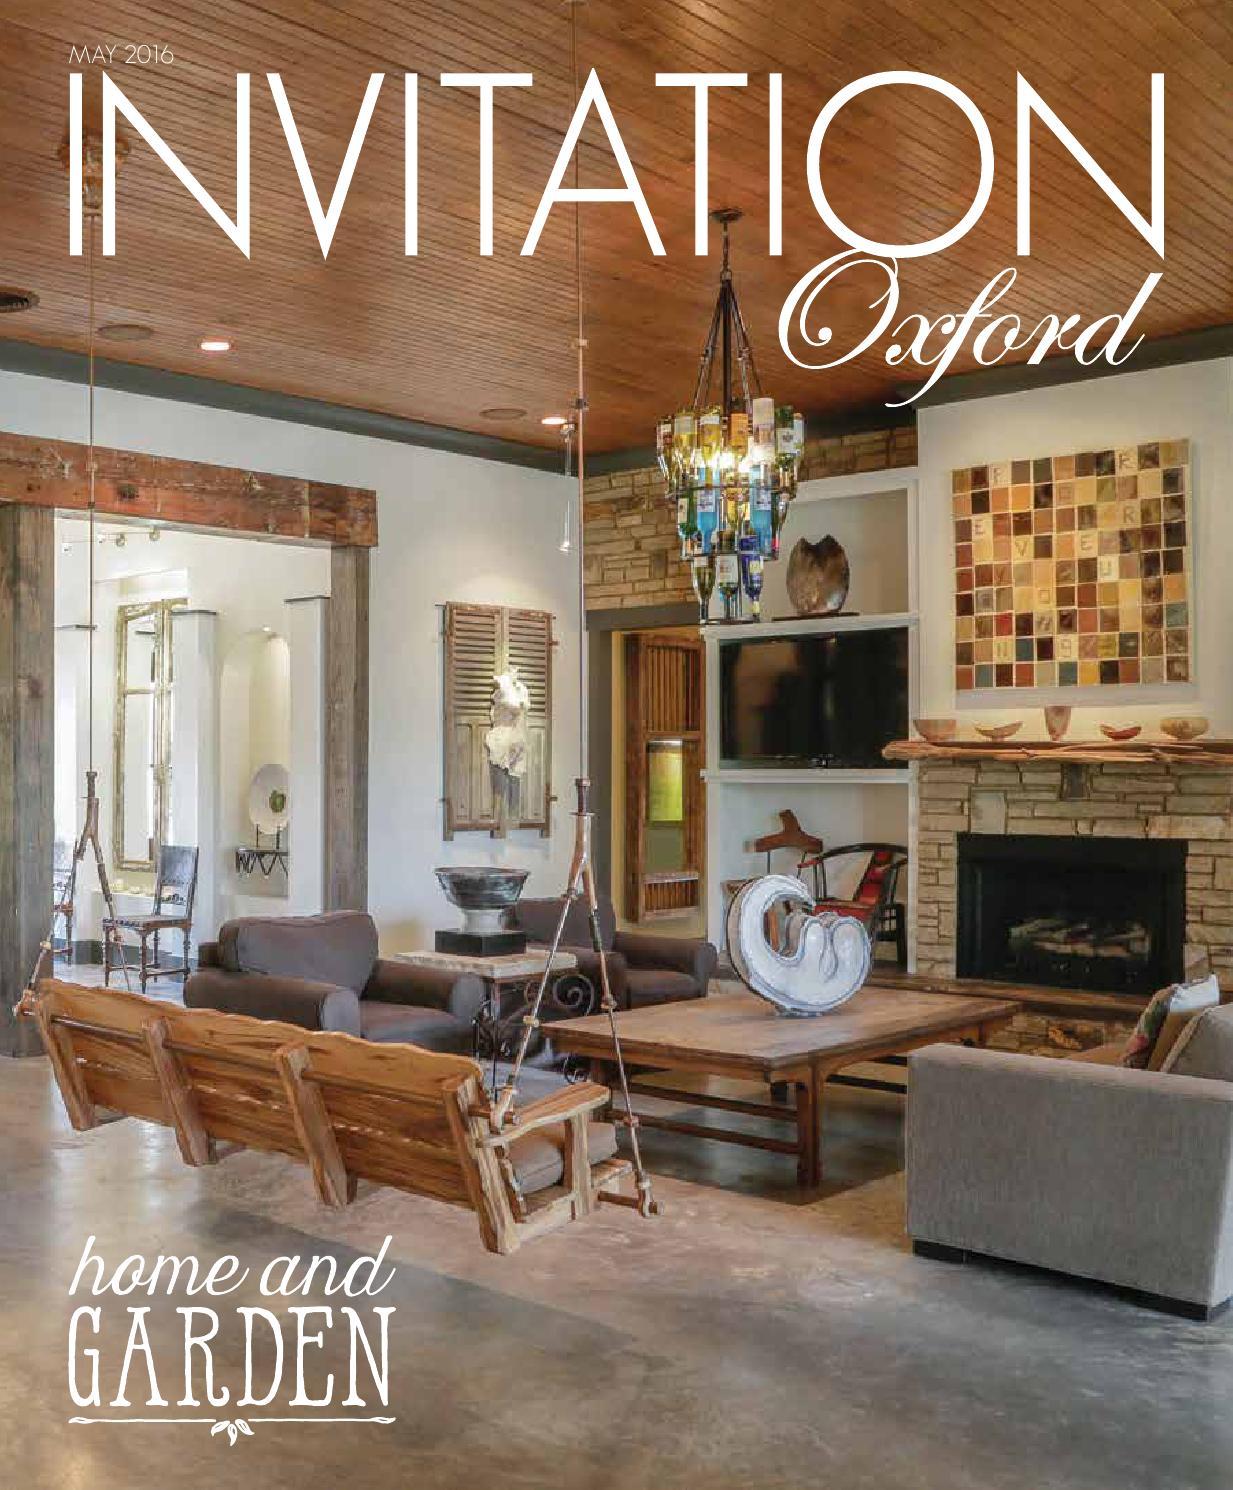 Wonderful Invitation Oxford   May 2016